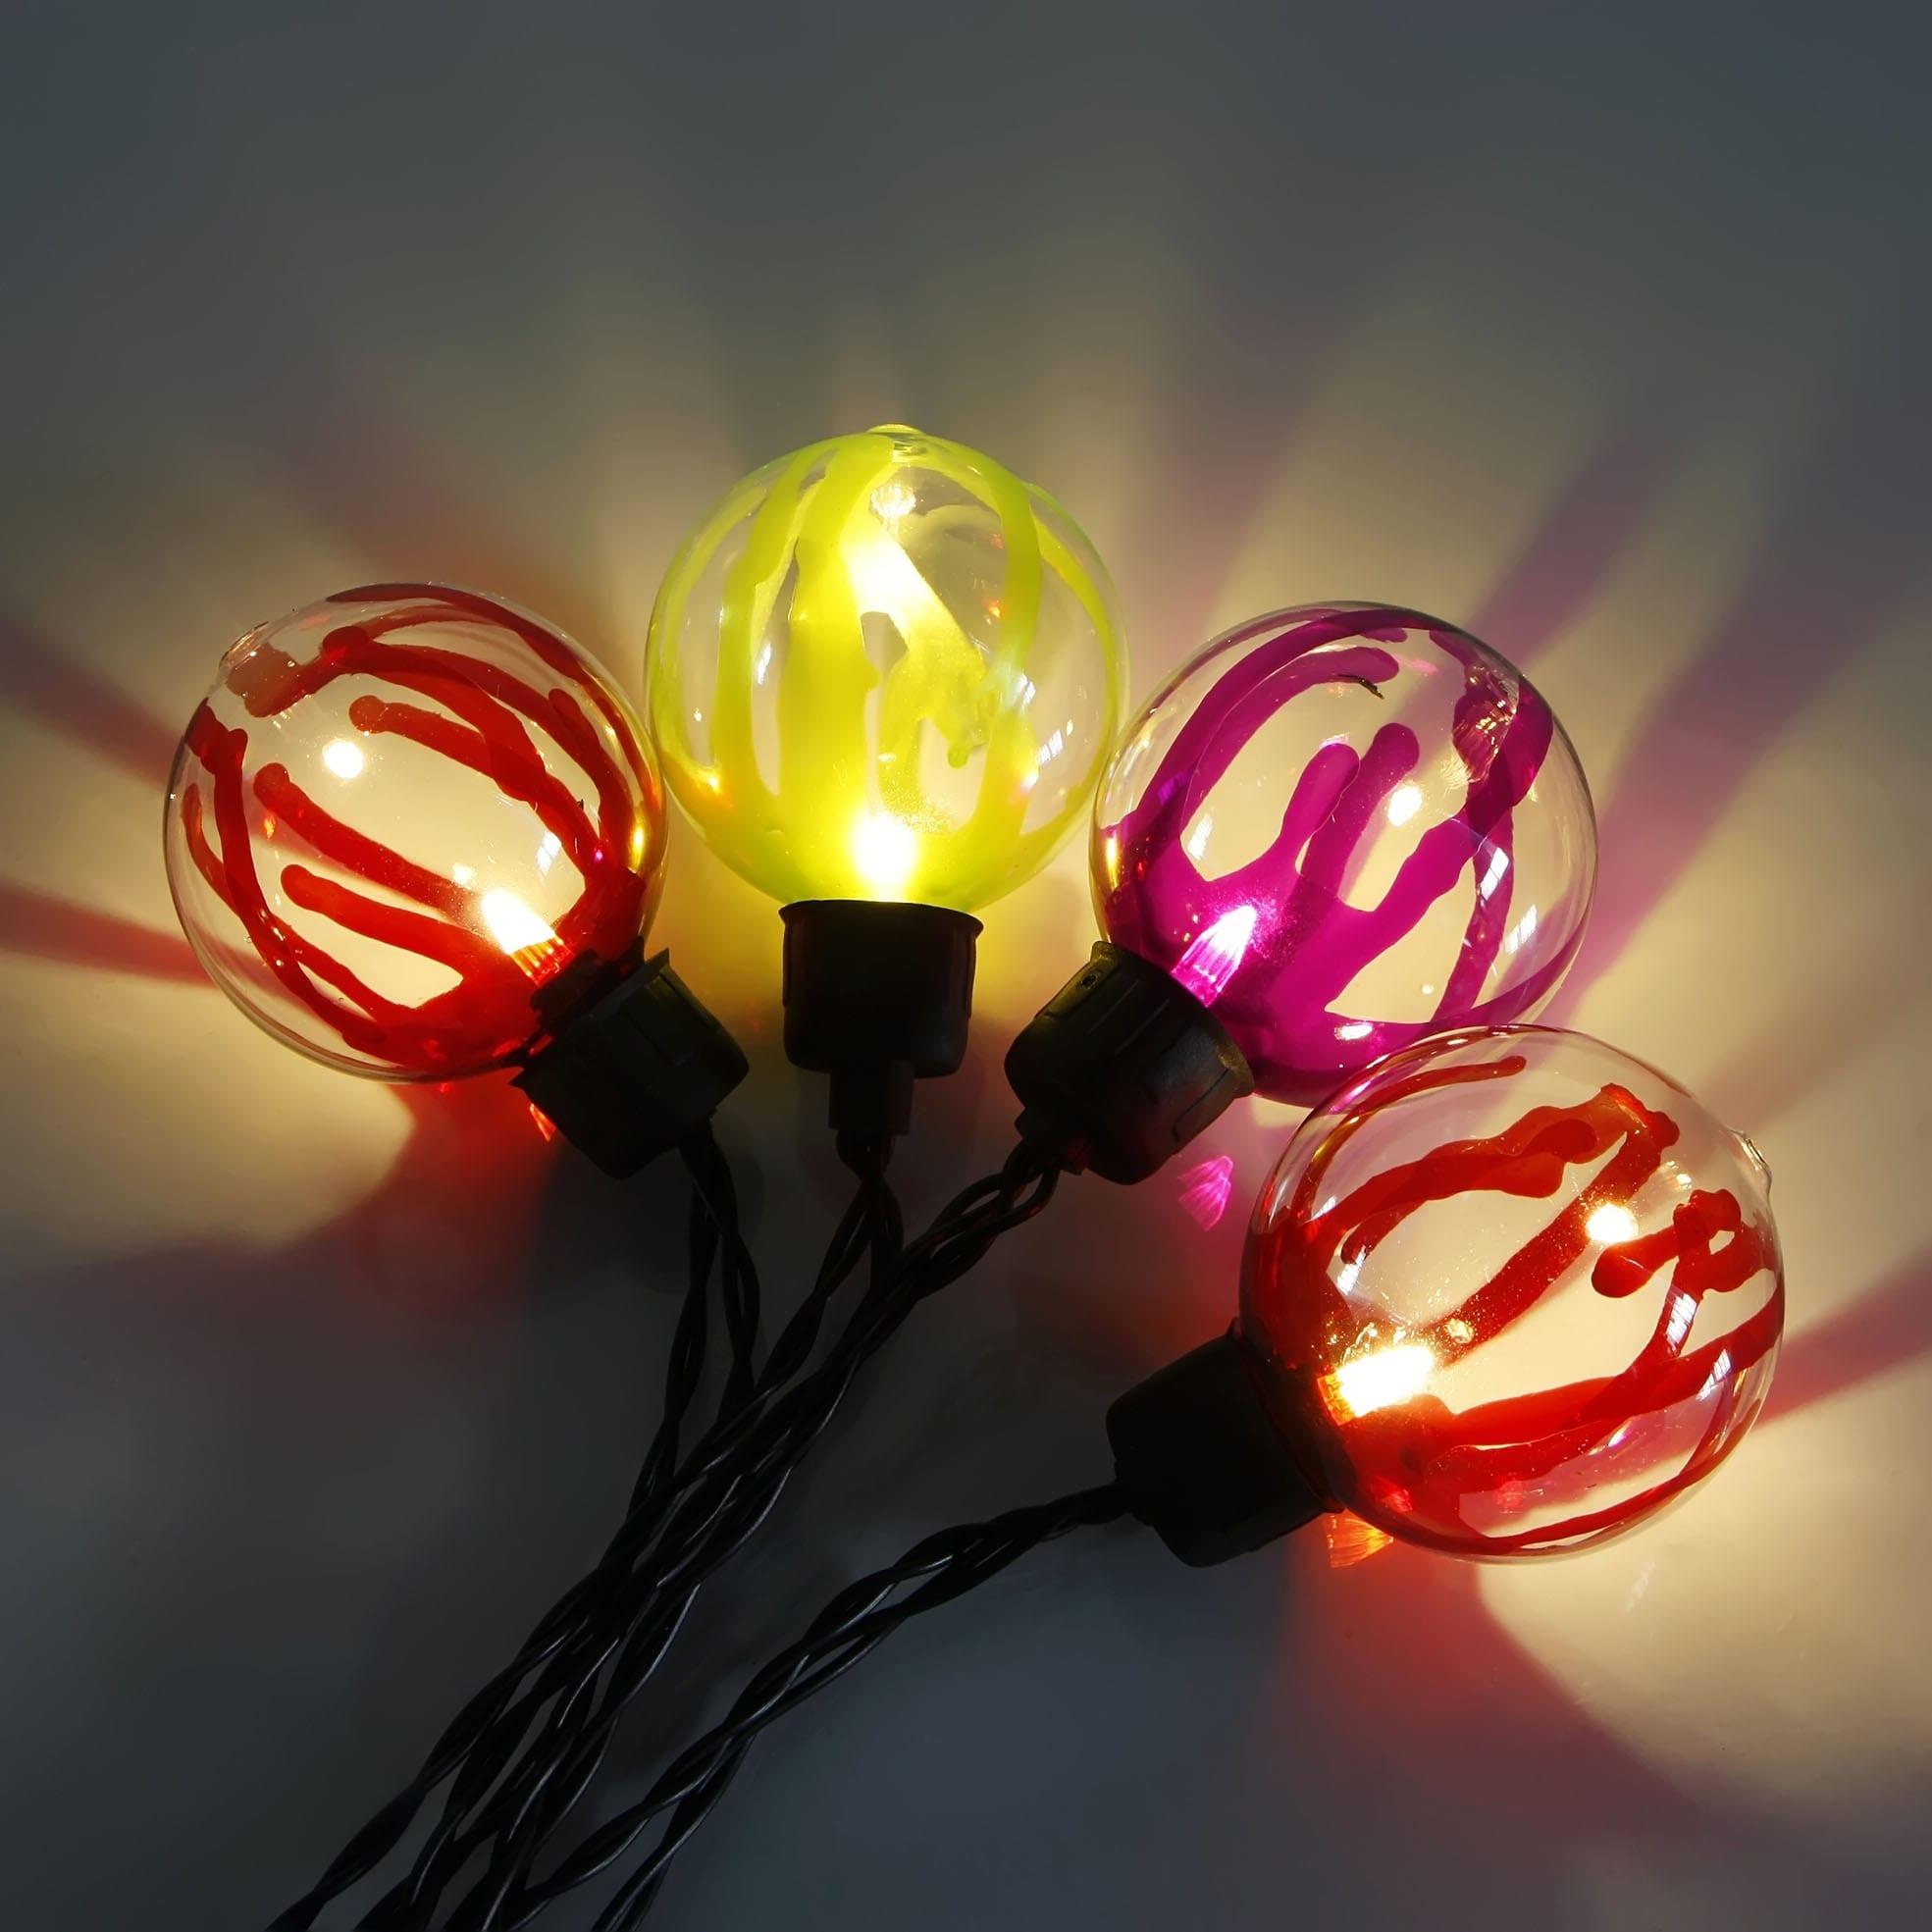 Gl Steel Cafe String Lights - Glass Covers  MYHH02024-BO(R)  – Zhongxin